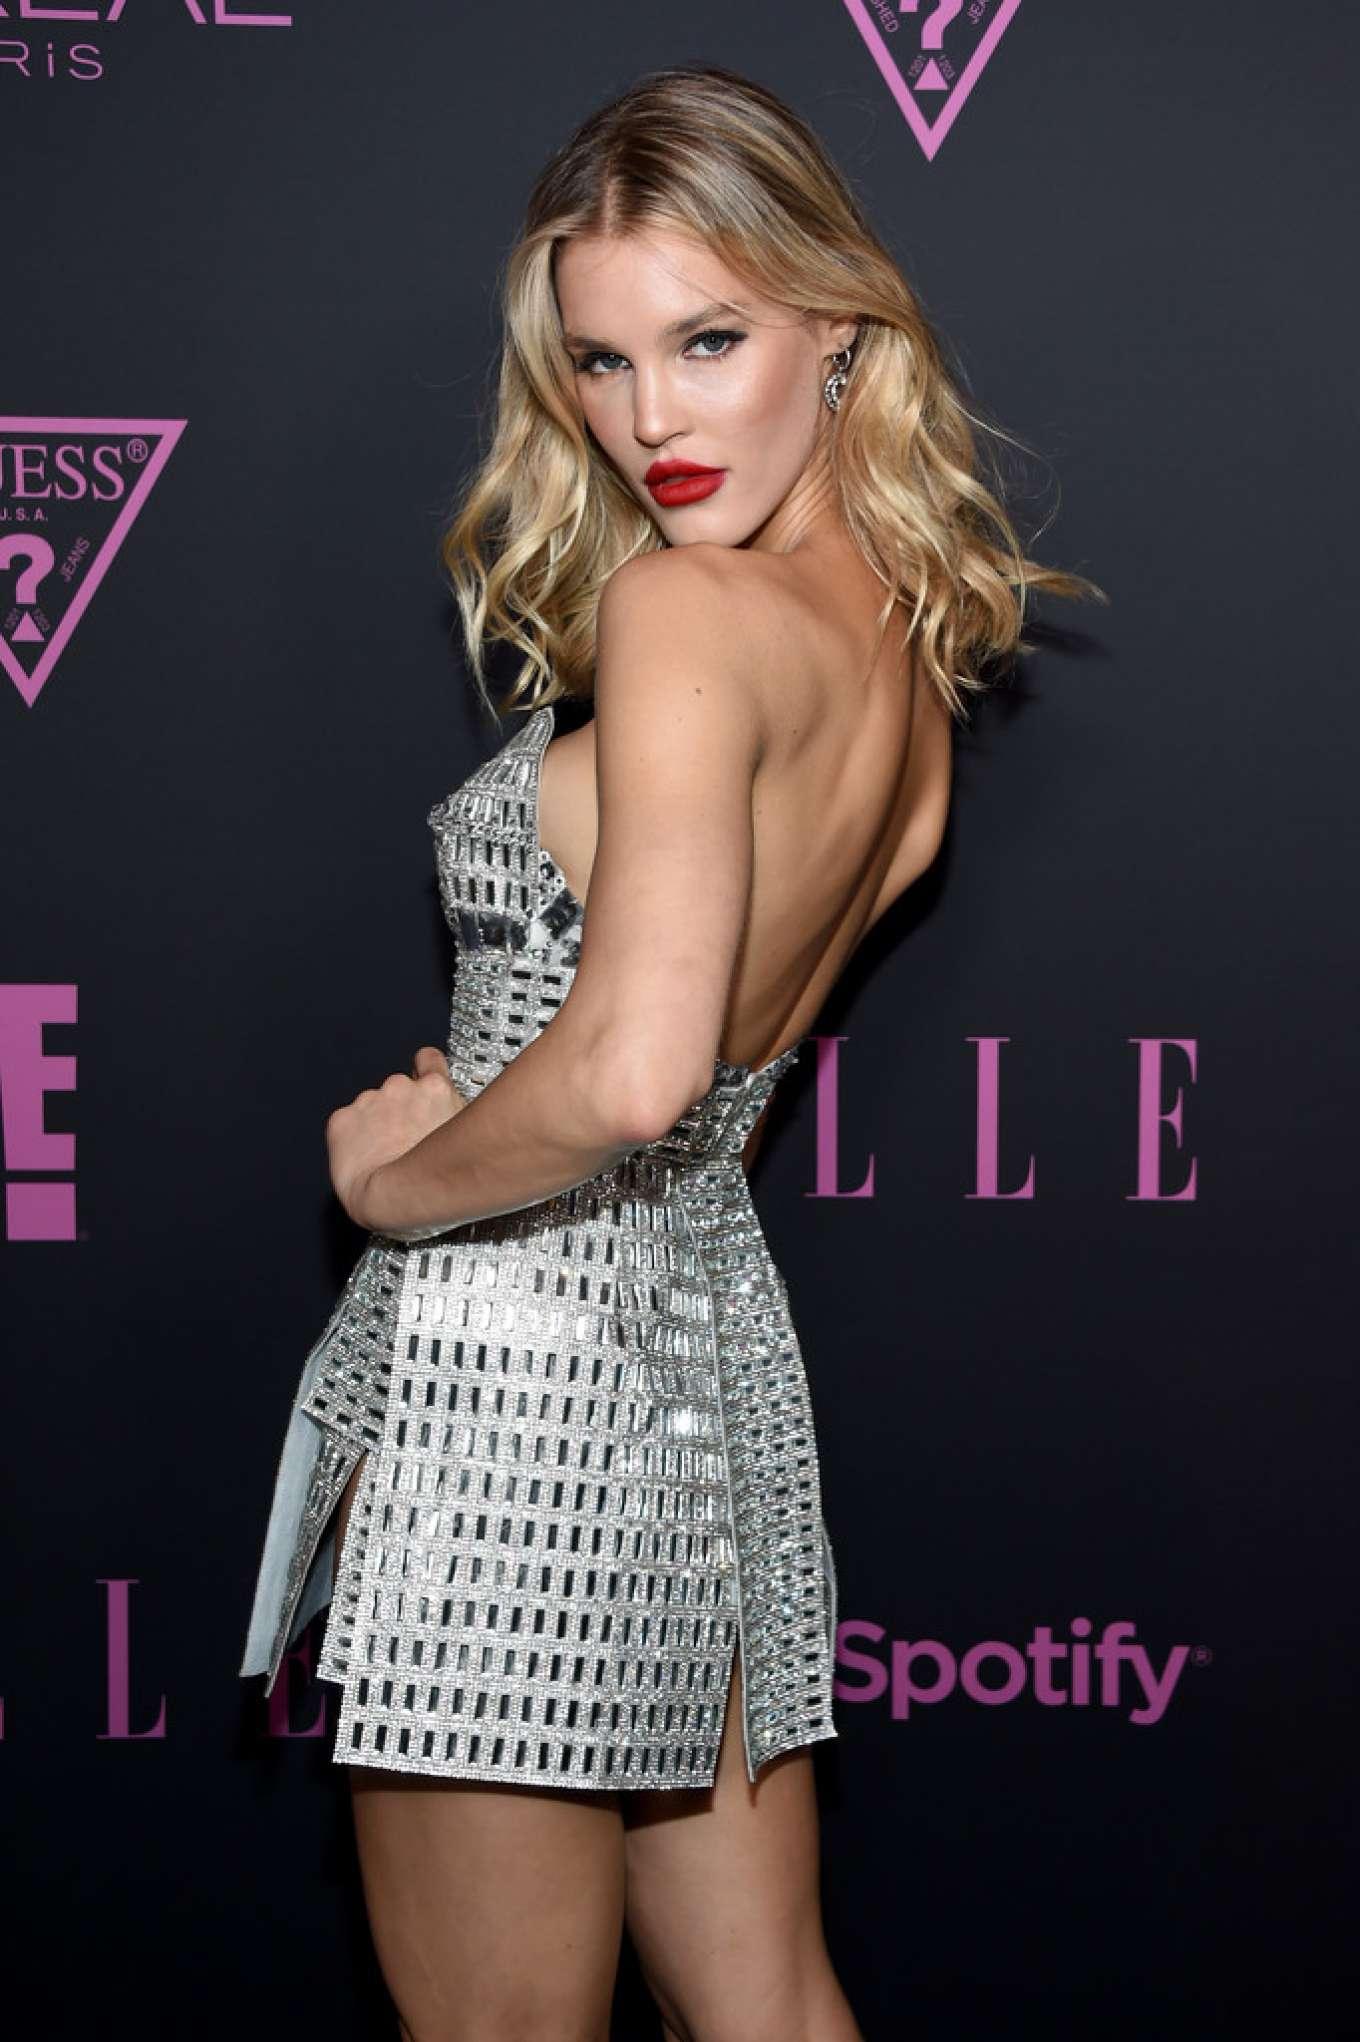 Joy Corrigan 2019 : Joy Corrigan – ELLE Women in Music presented by Spotify-05